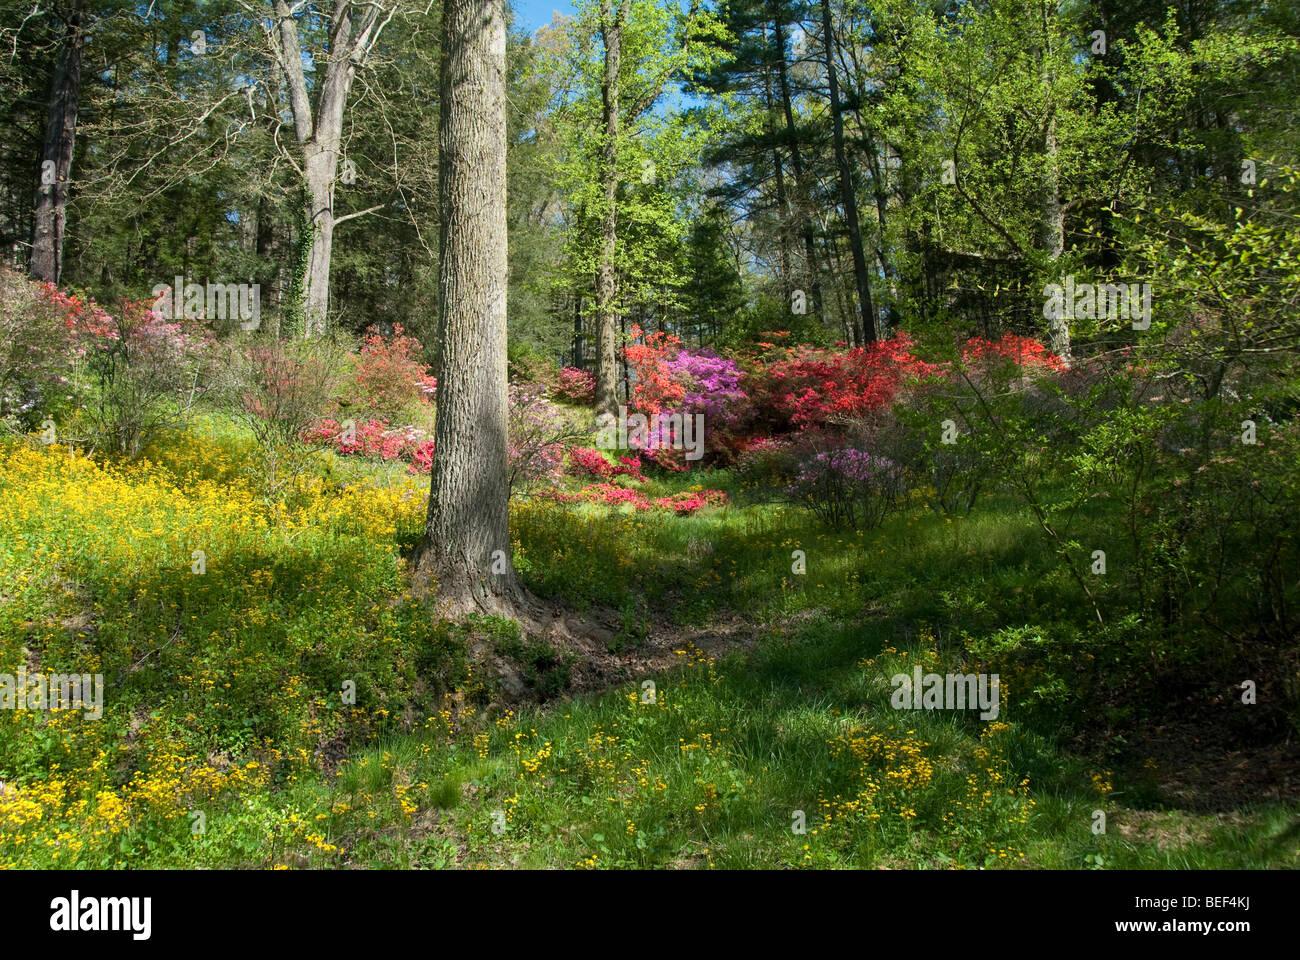 Azaleas on the Biltmore Estate in Asheville, North Carolina, USA - Stock Image